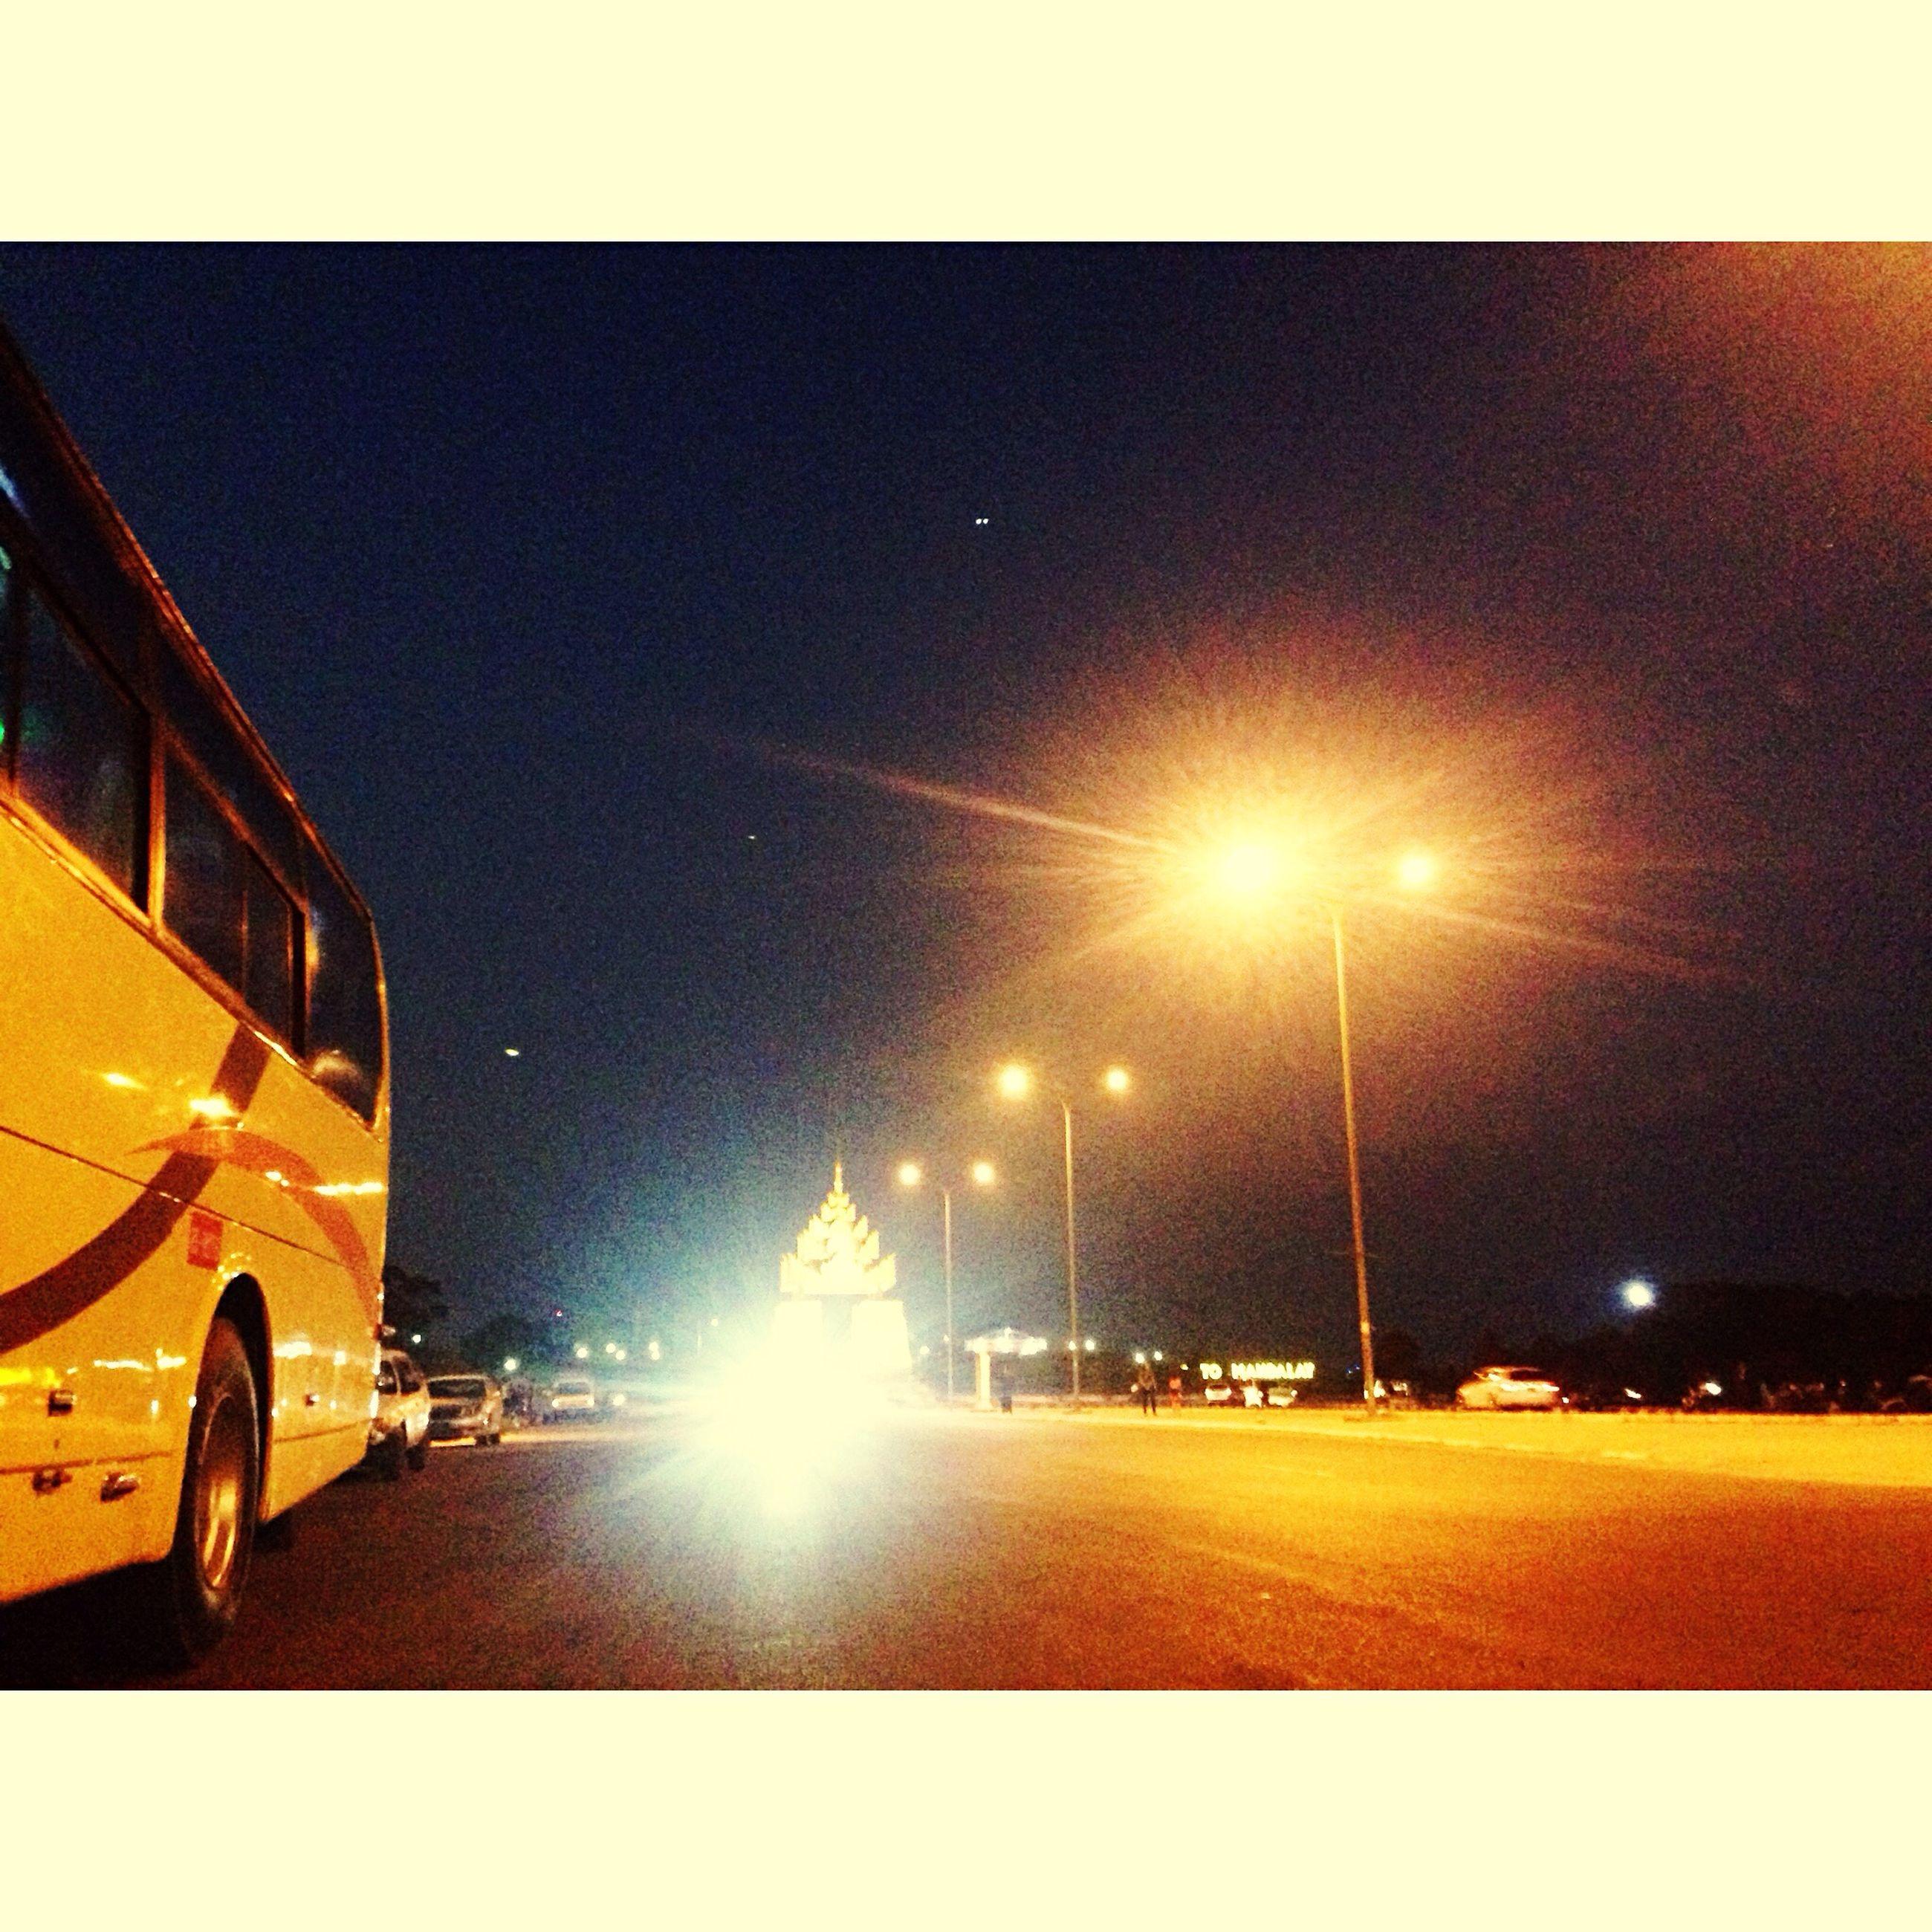 transportation, car, land vehicle, lens flare, street light, mode of transport, illuminated, night, sky, road, outdoors, tree, sunset, no people, architecture